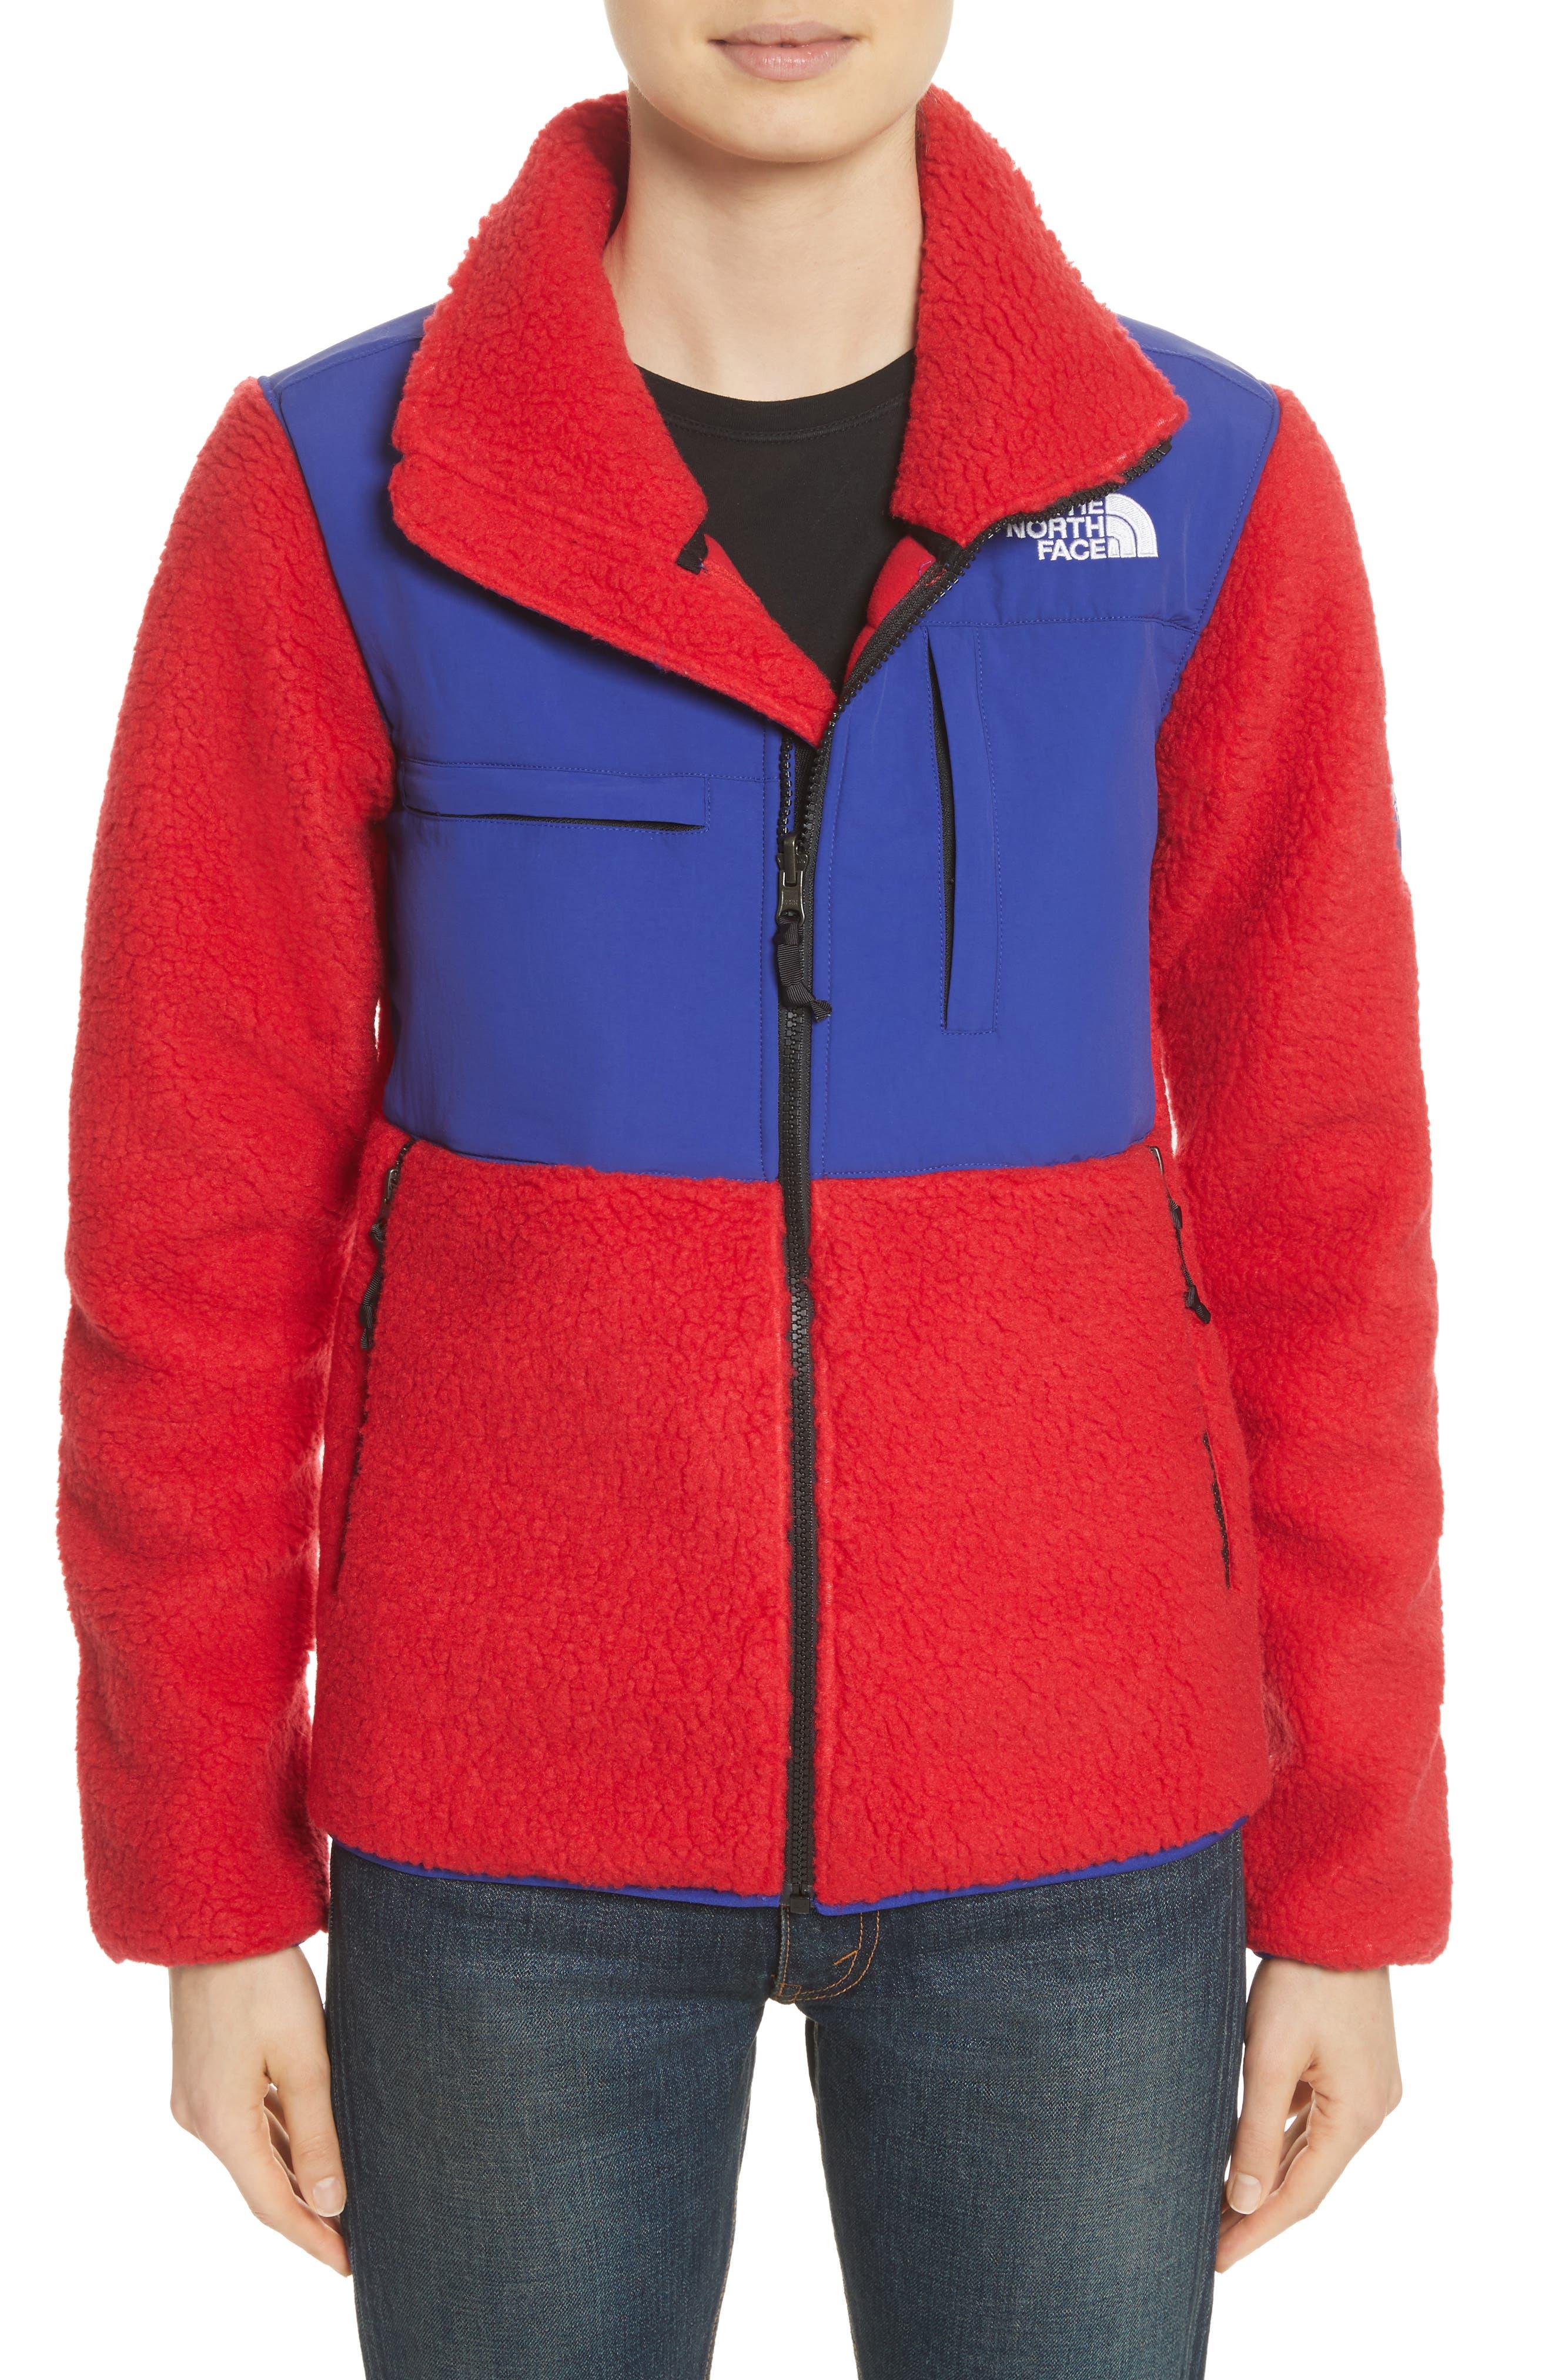 Denali Jacket,                             Alternate thumbnail 2, color,                             Tnf Red